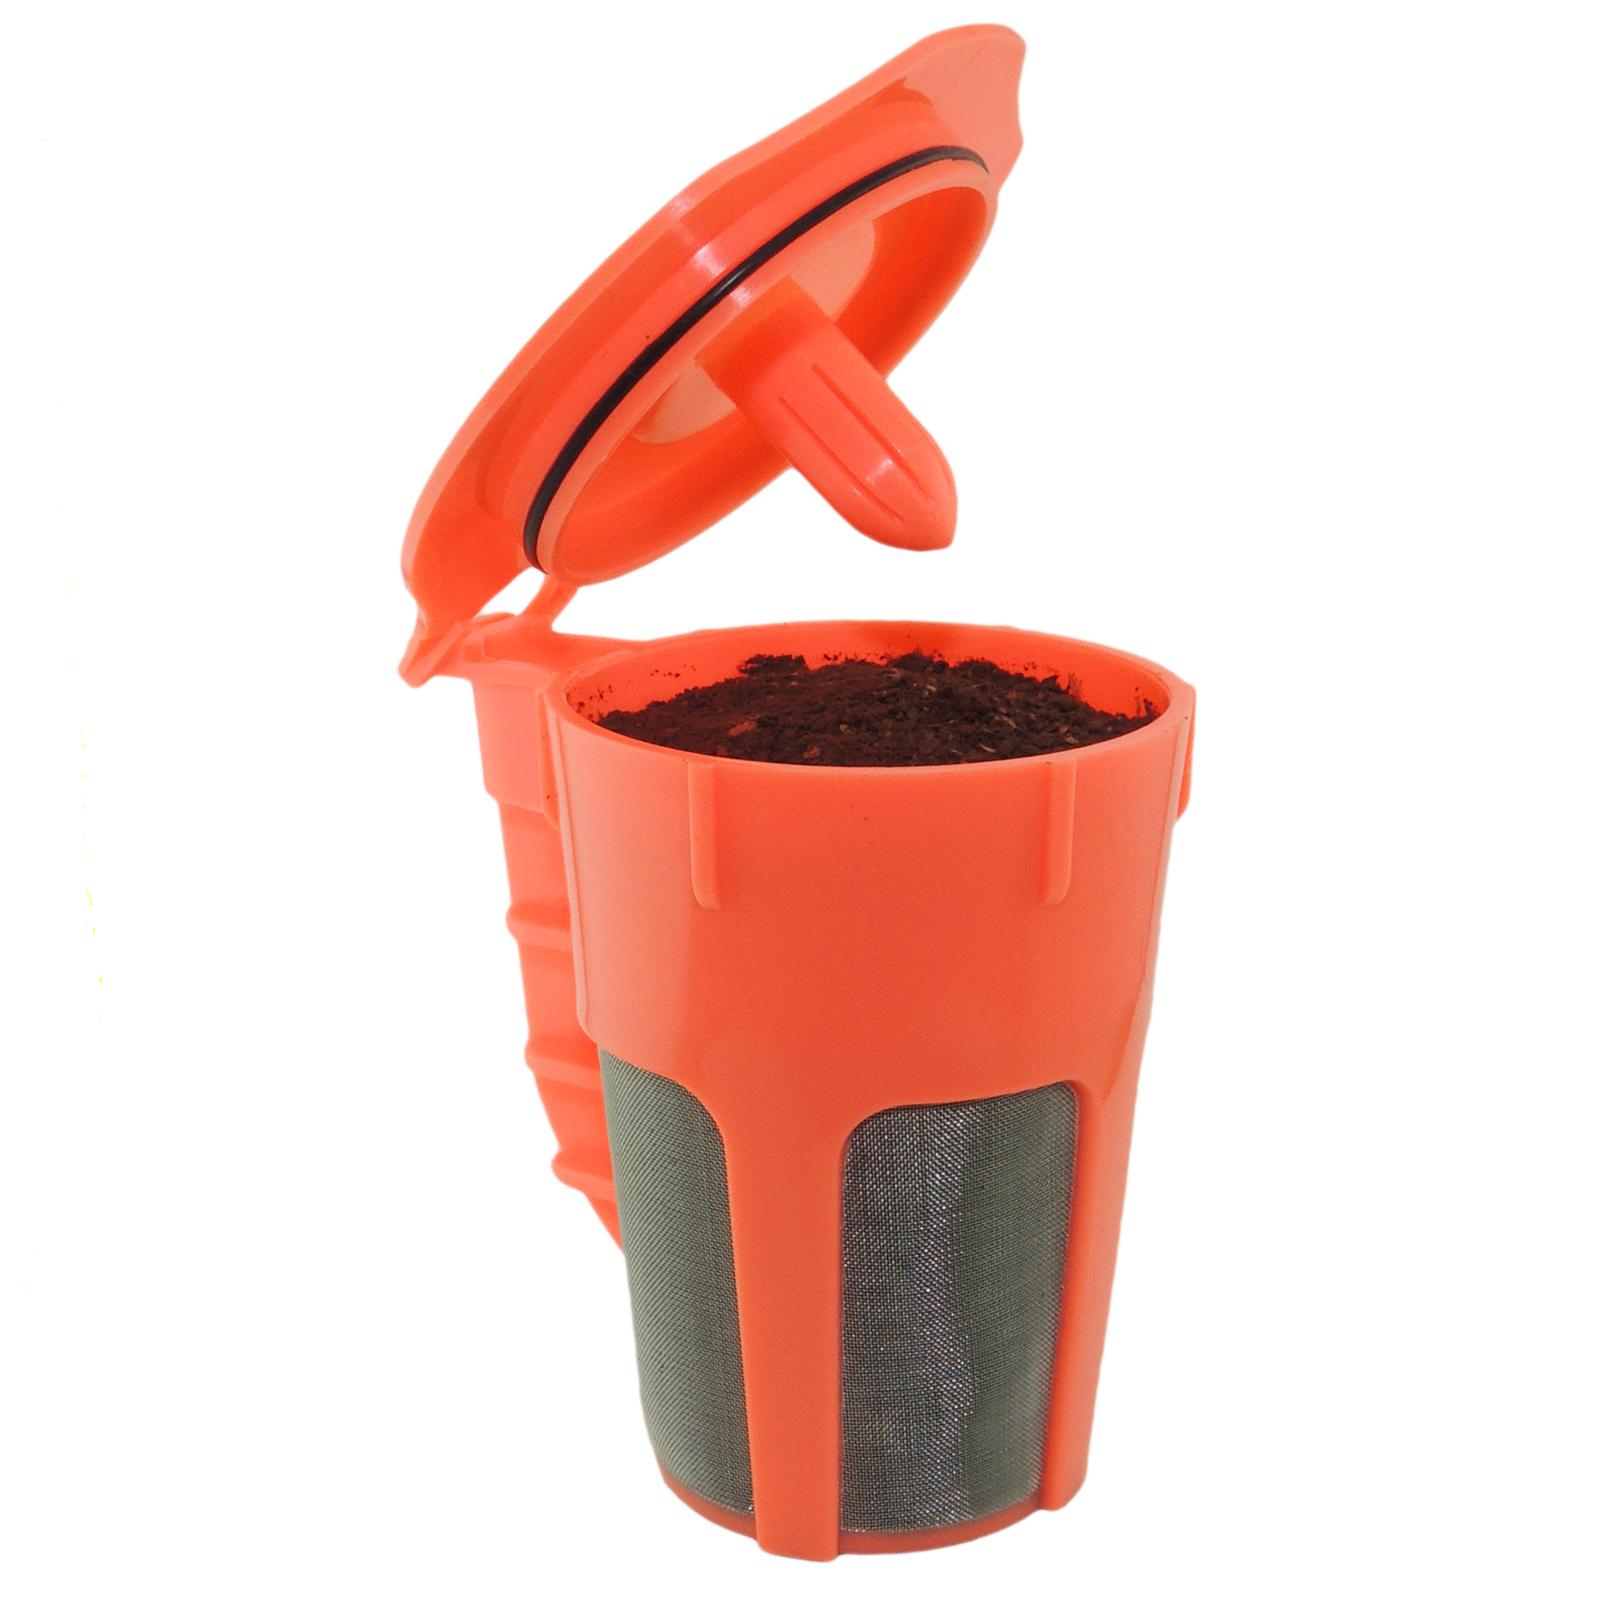 Keurig 2.0 K-carafe Reusable K-cup Filter Keurig K-cups for 2.0 Brewers 3-Pack